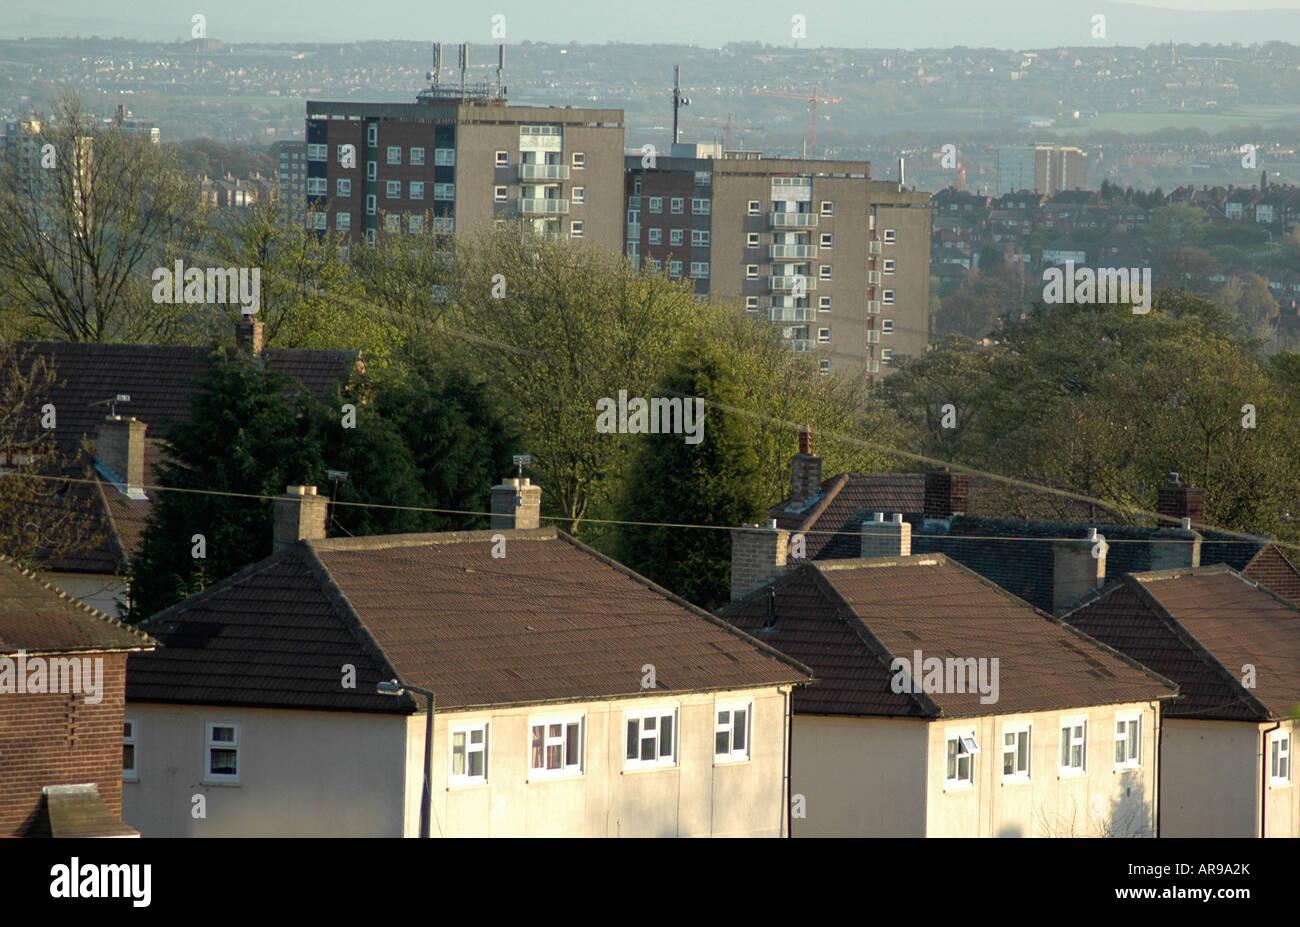 Council Housing, Seacroft, Leeds - Stock Image